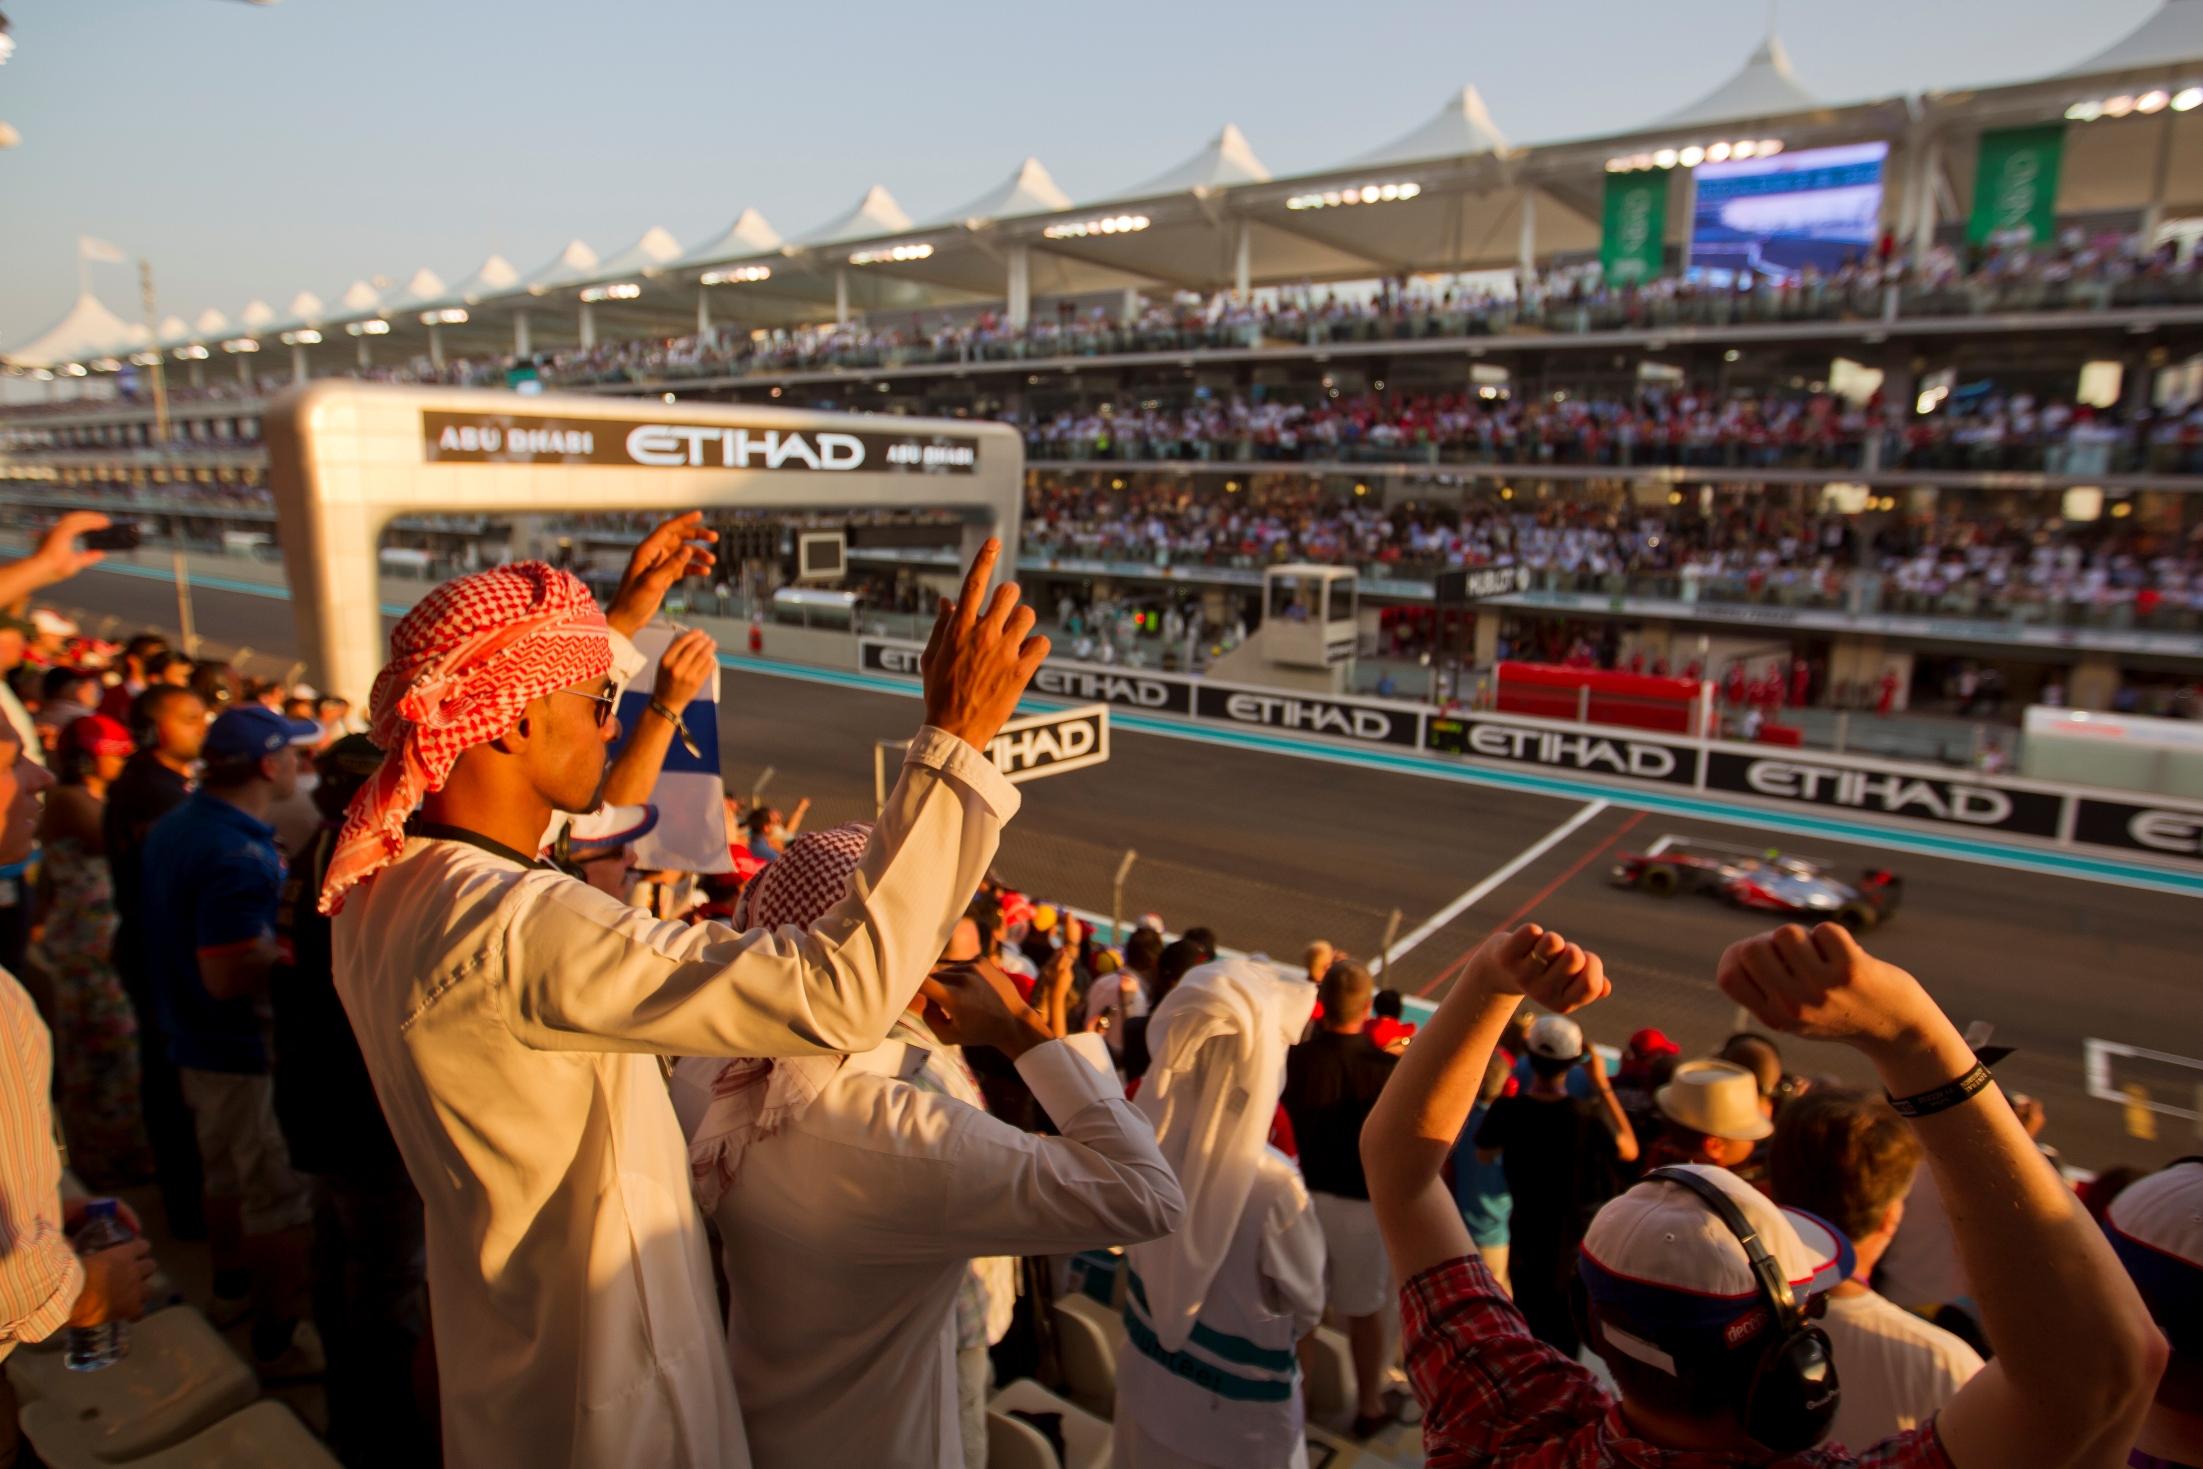 2015 F1 Etihad Airways Abu Dhabi Grand Prix 2